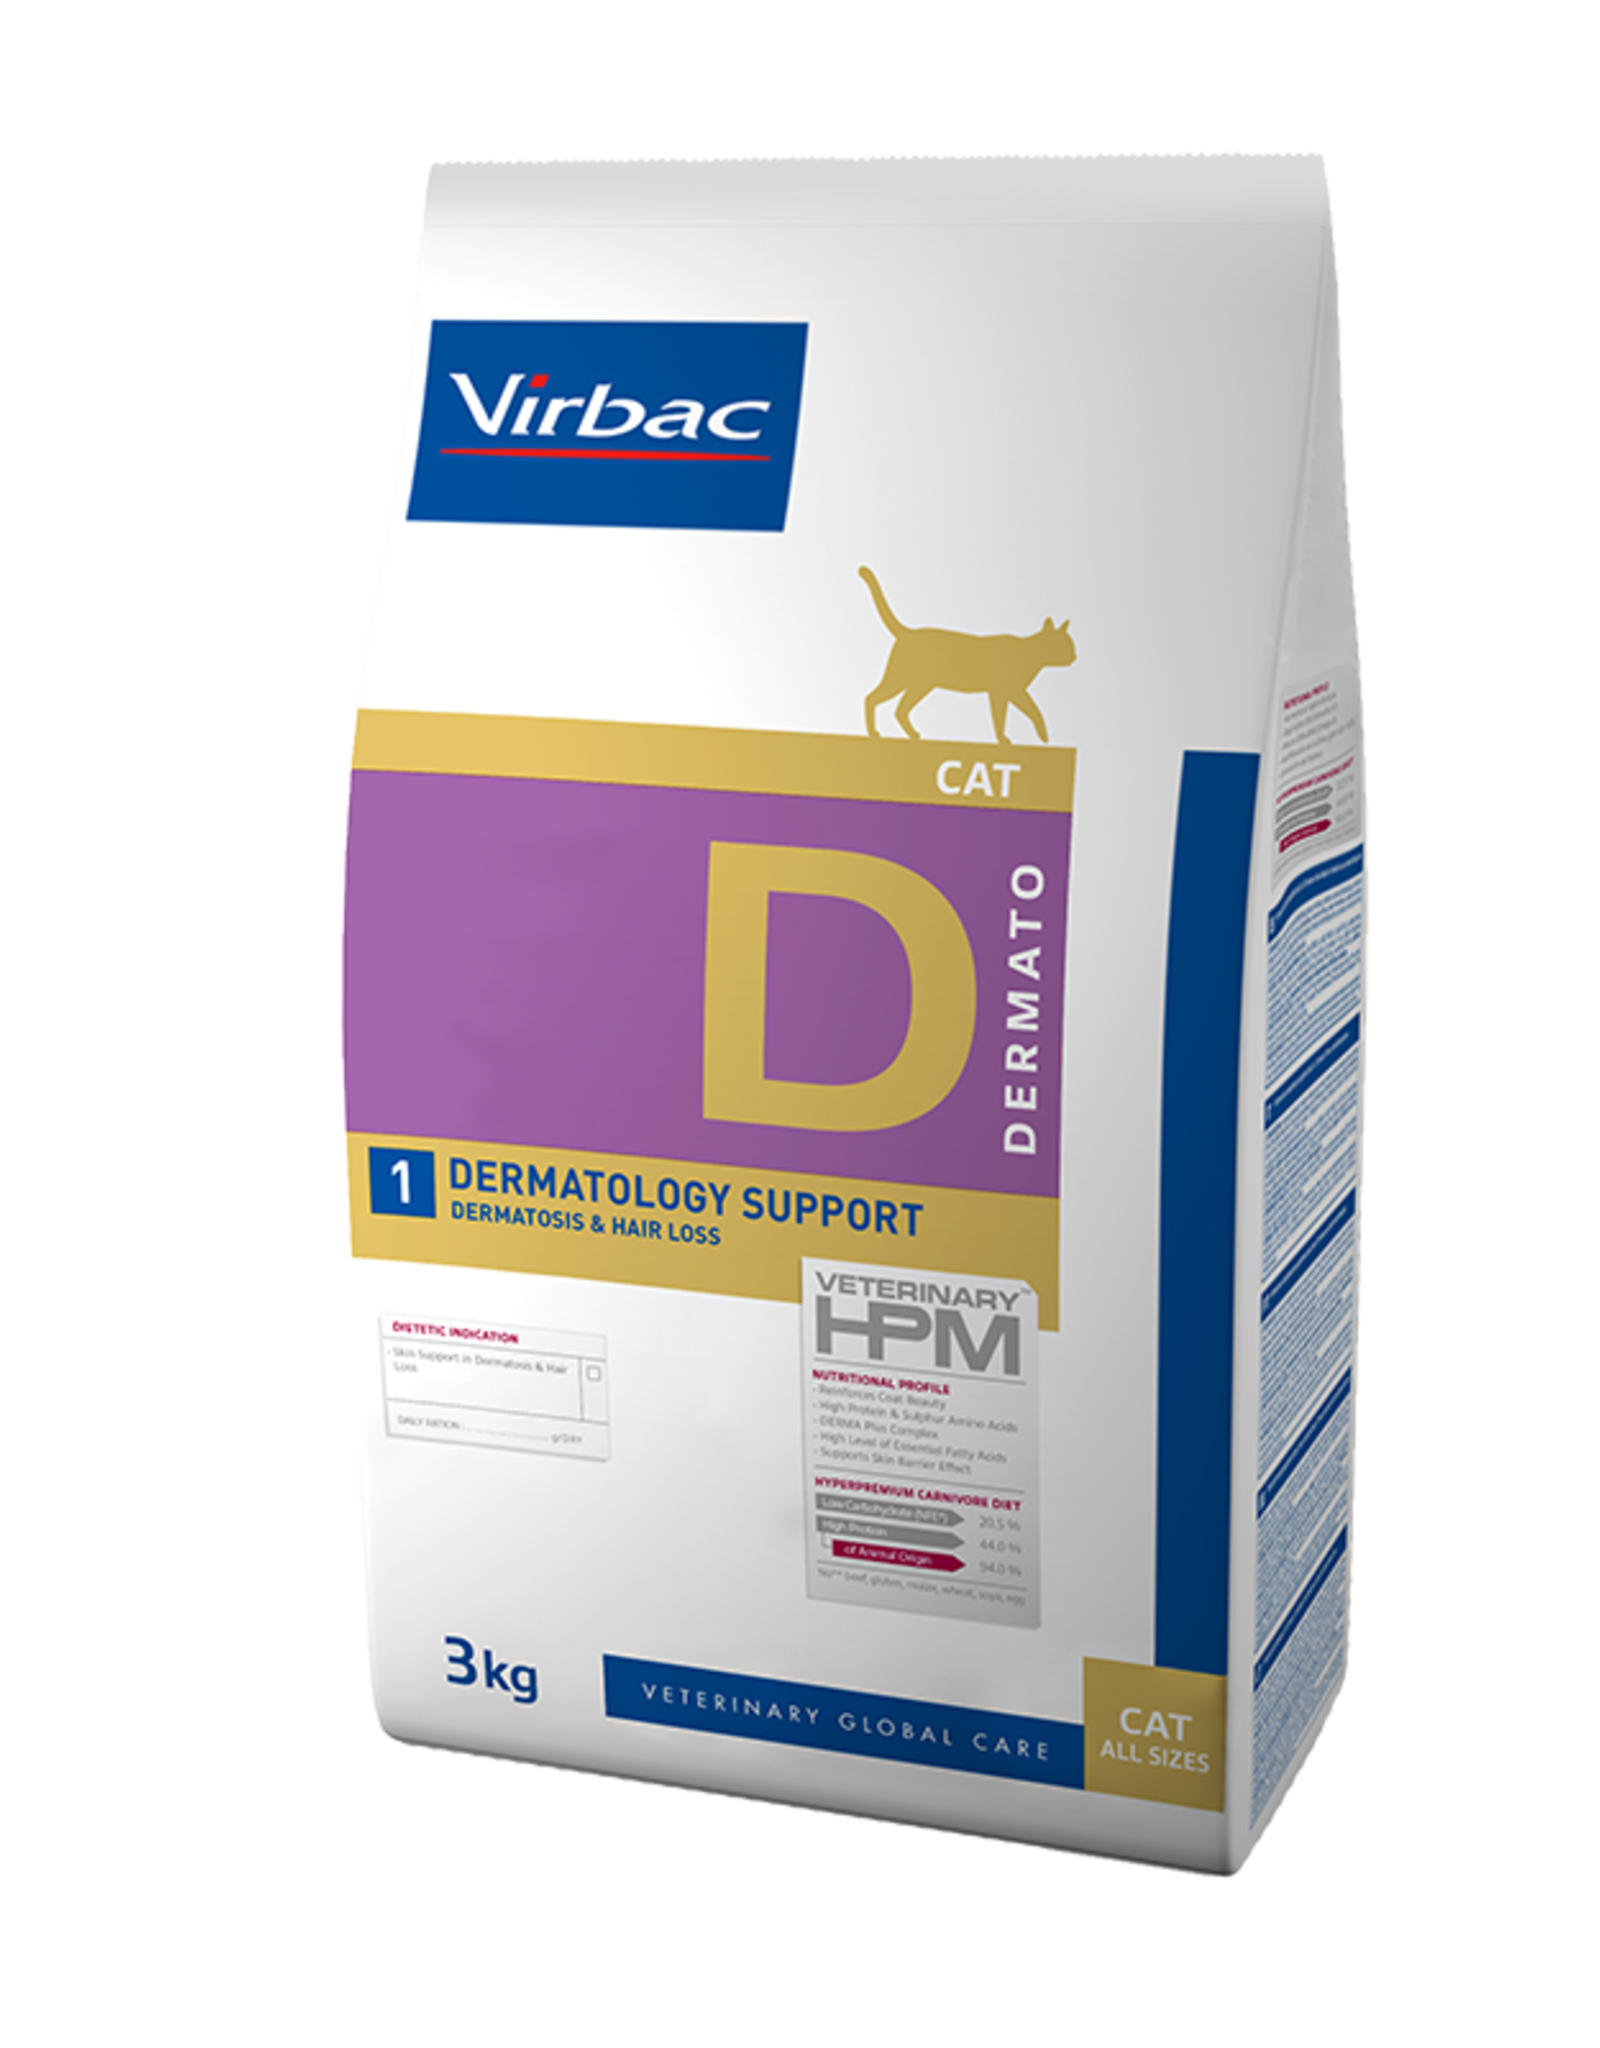 Virbac Virbac Hpm Kat Dermatology Support D1 3kg